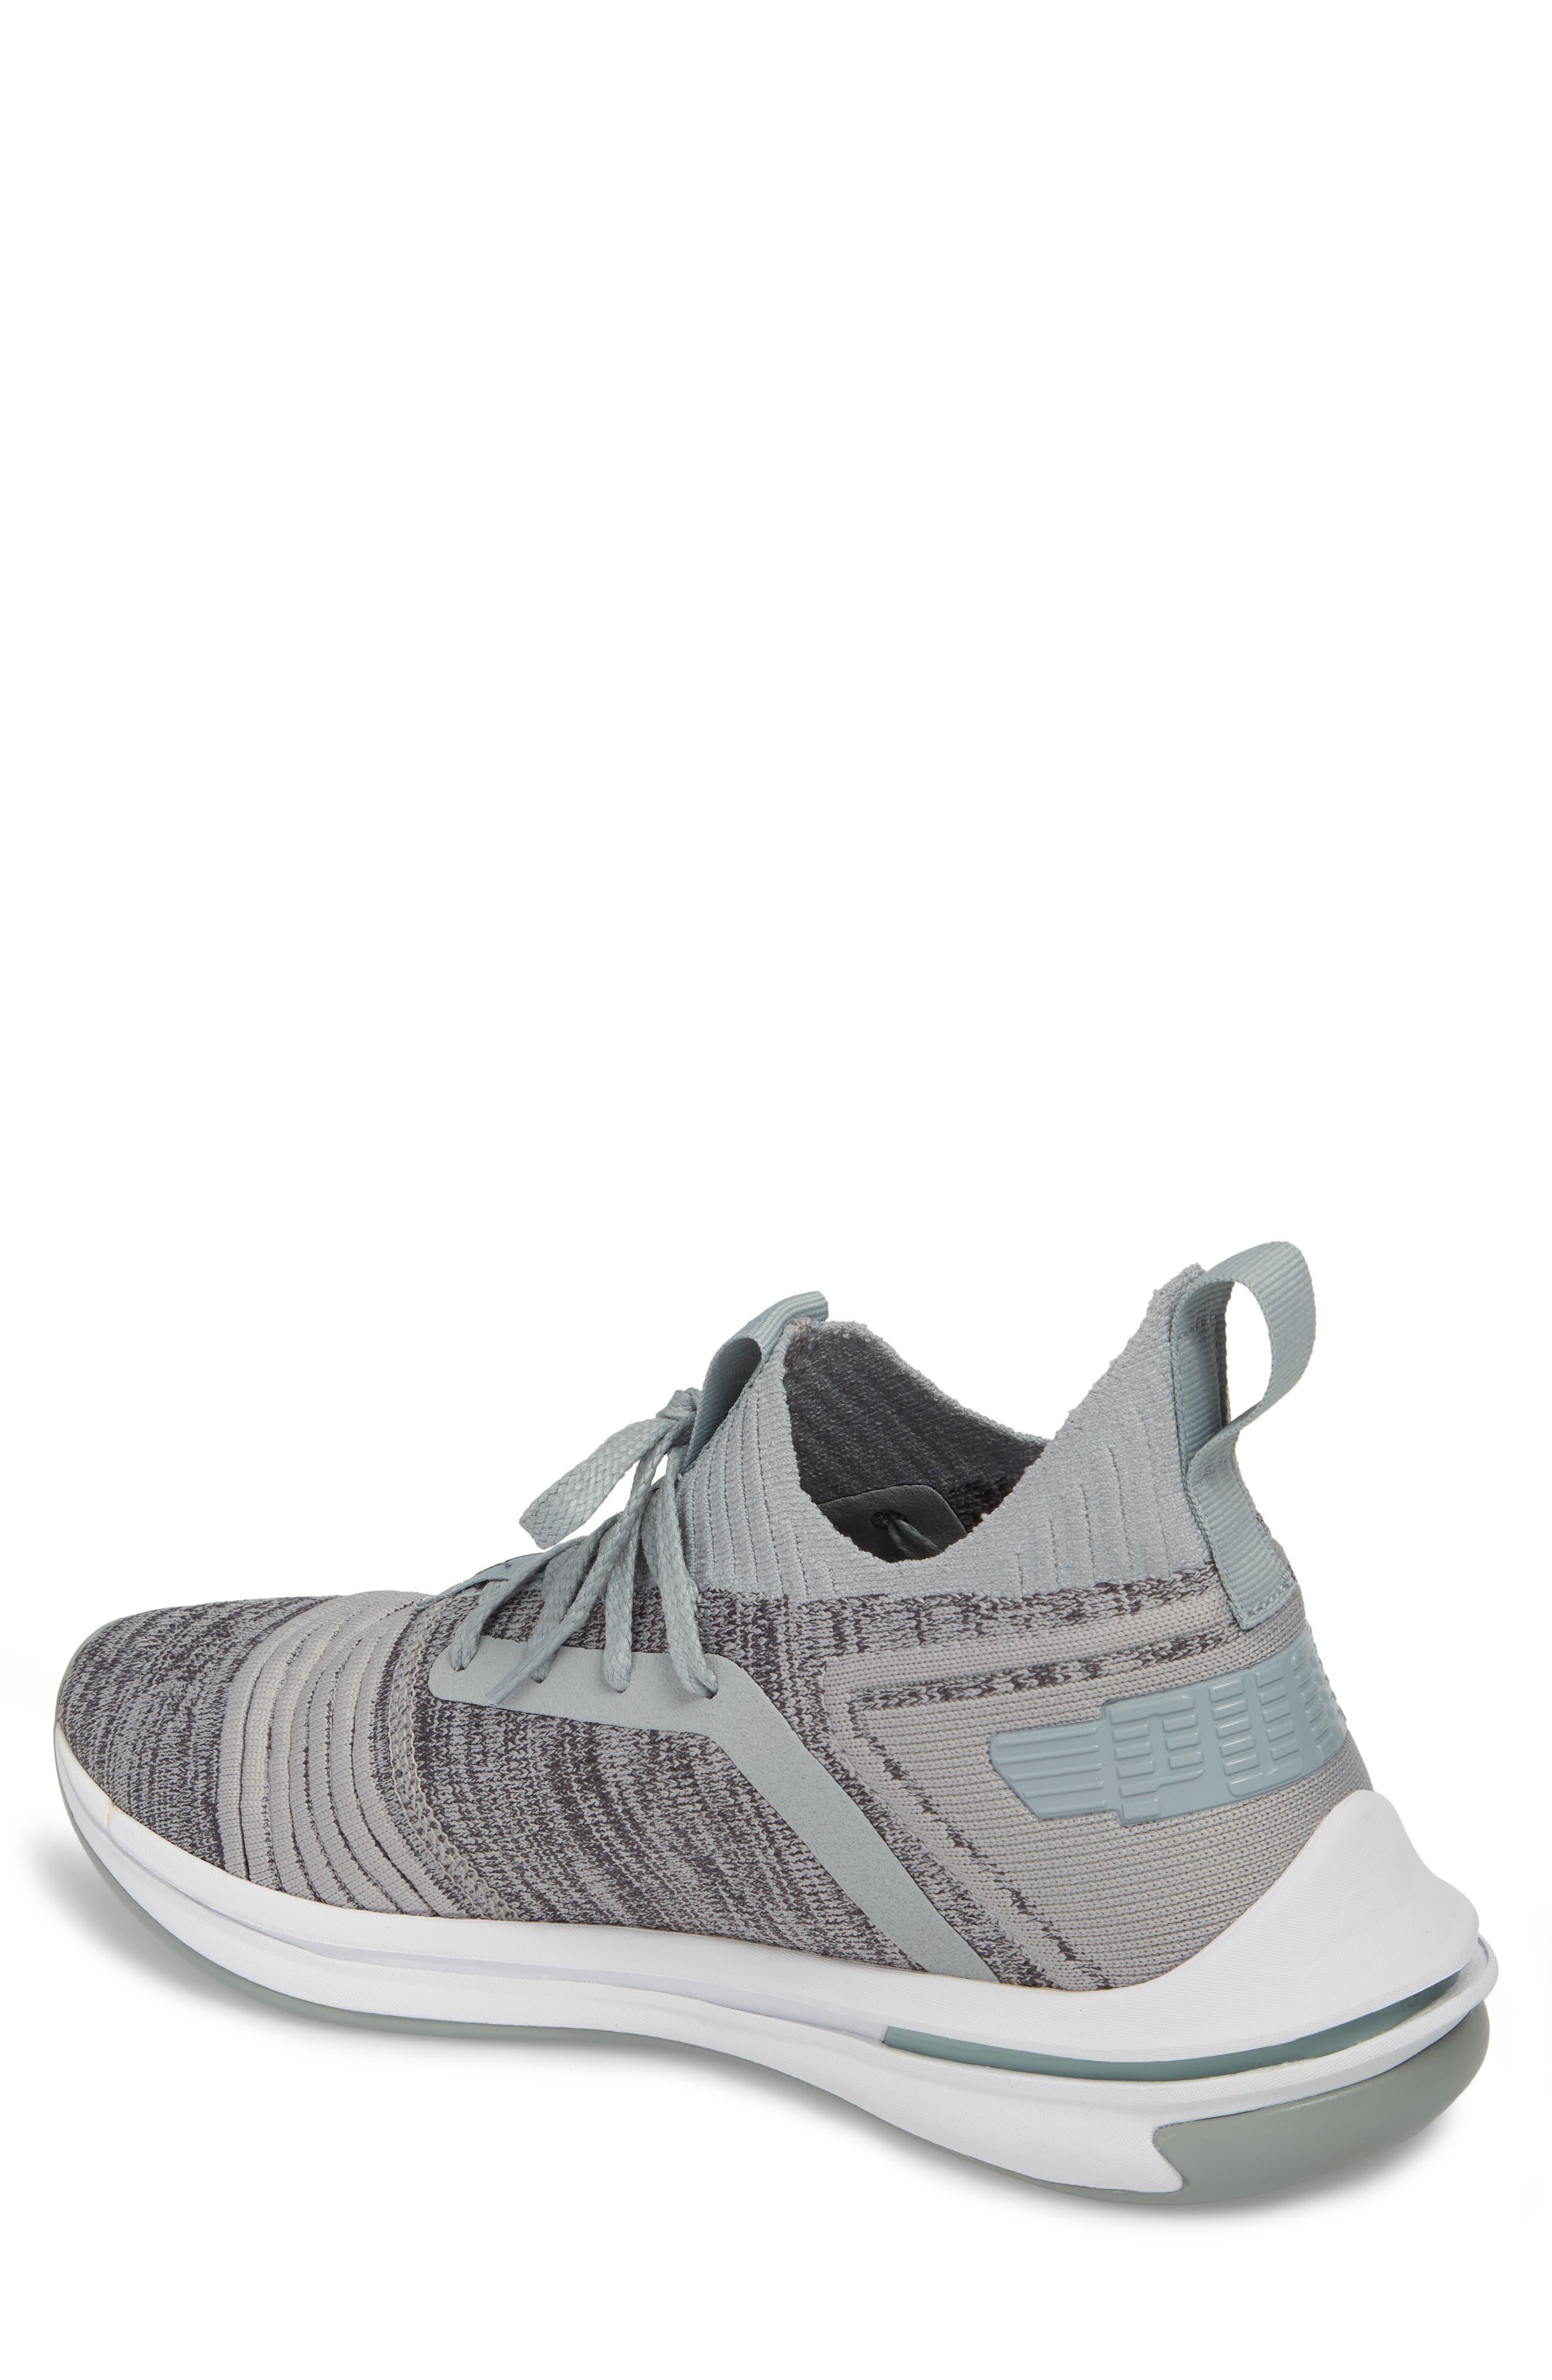 IGNITE Limitless SR evoKNIT Sneaker,                             Alternate thumbnail 2, color,                             Quarry